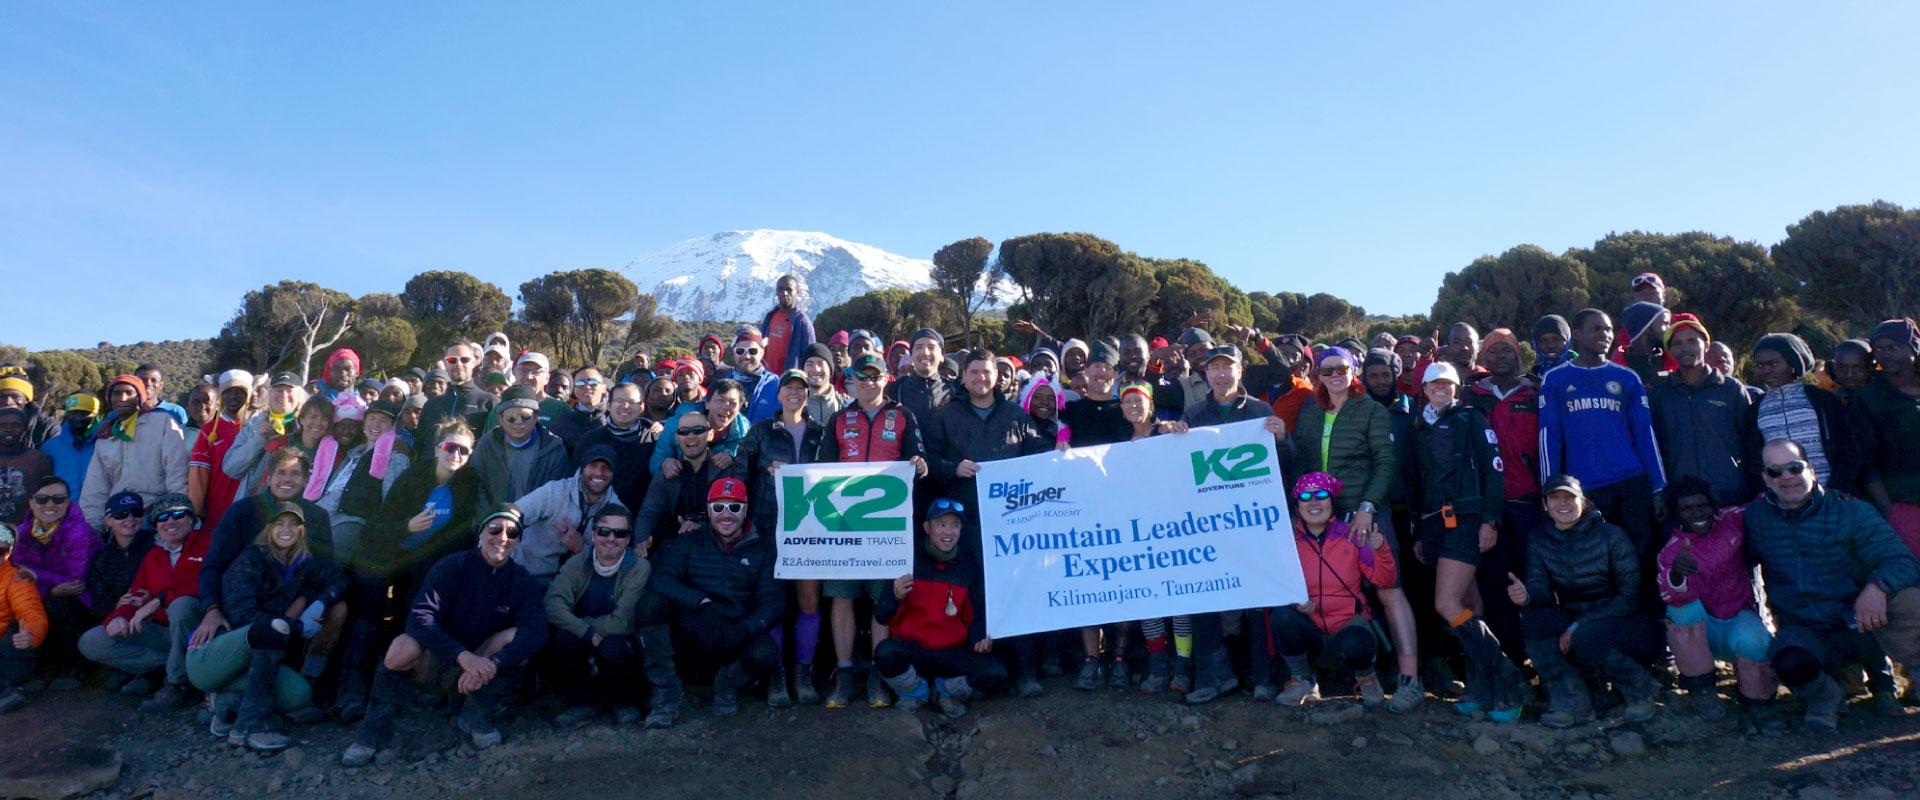 K2 adventure climbers kilimanjaro